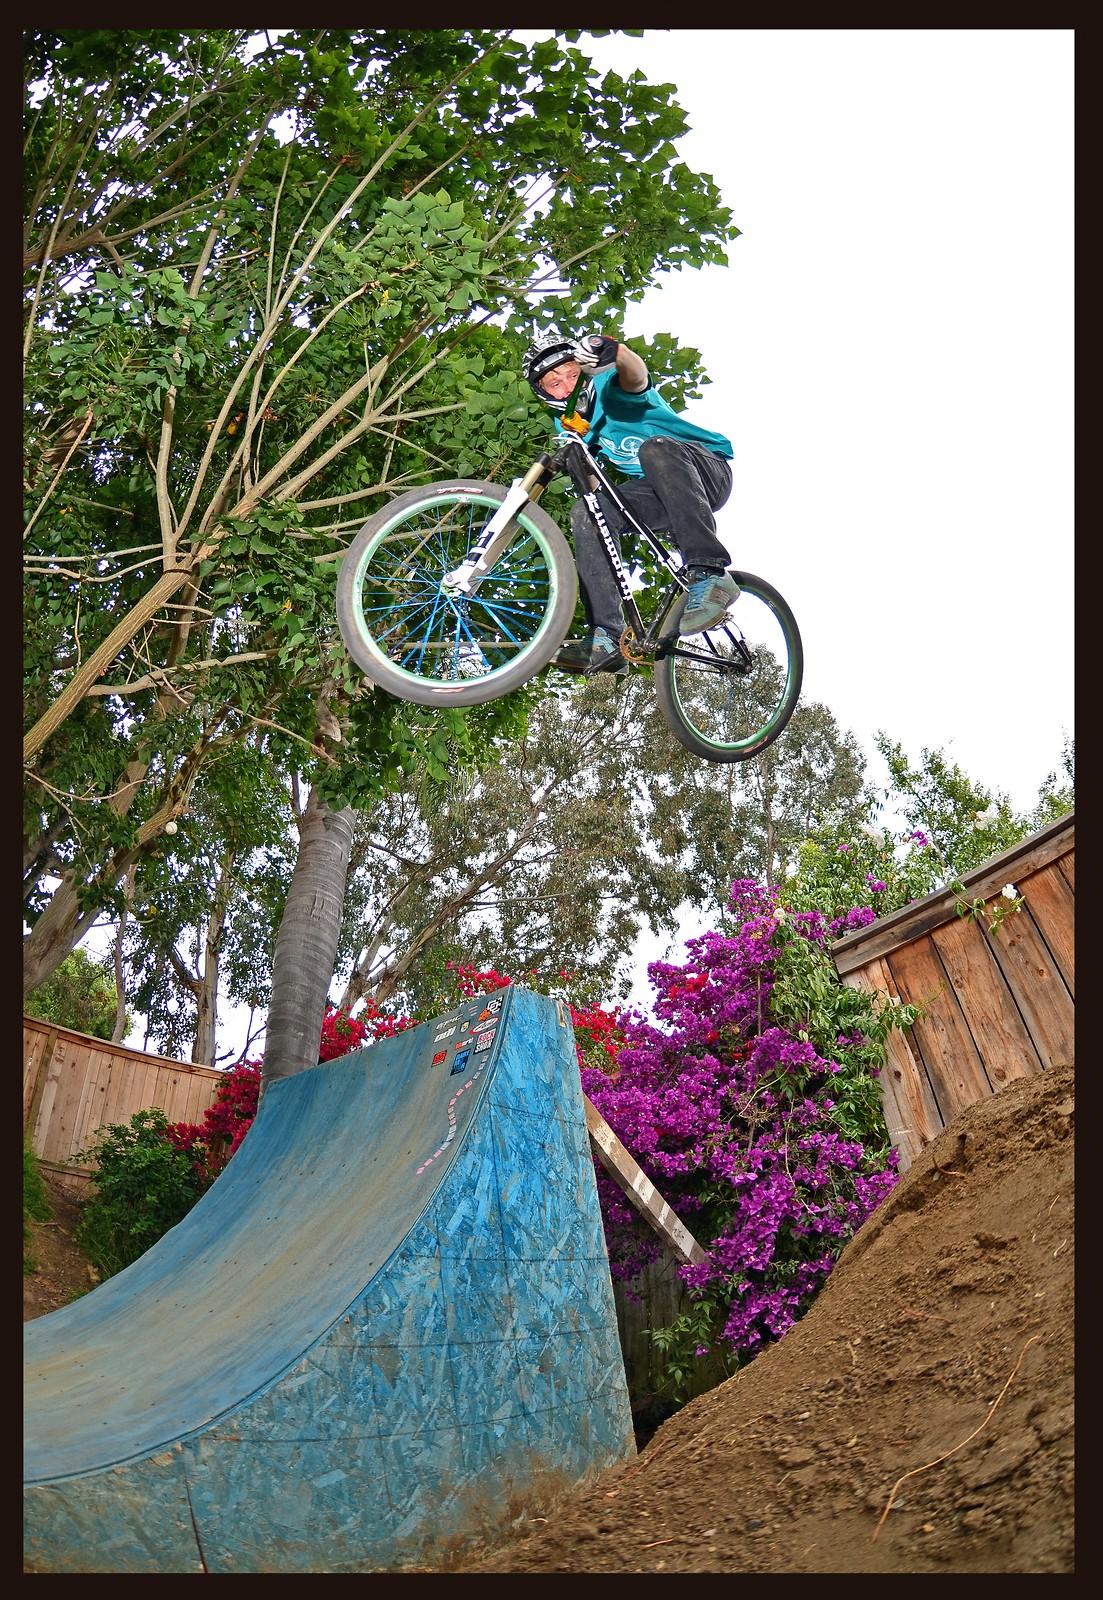 James 1 - pjsurf - Mountain Biking Pictures - Vital MTB